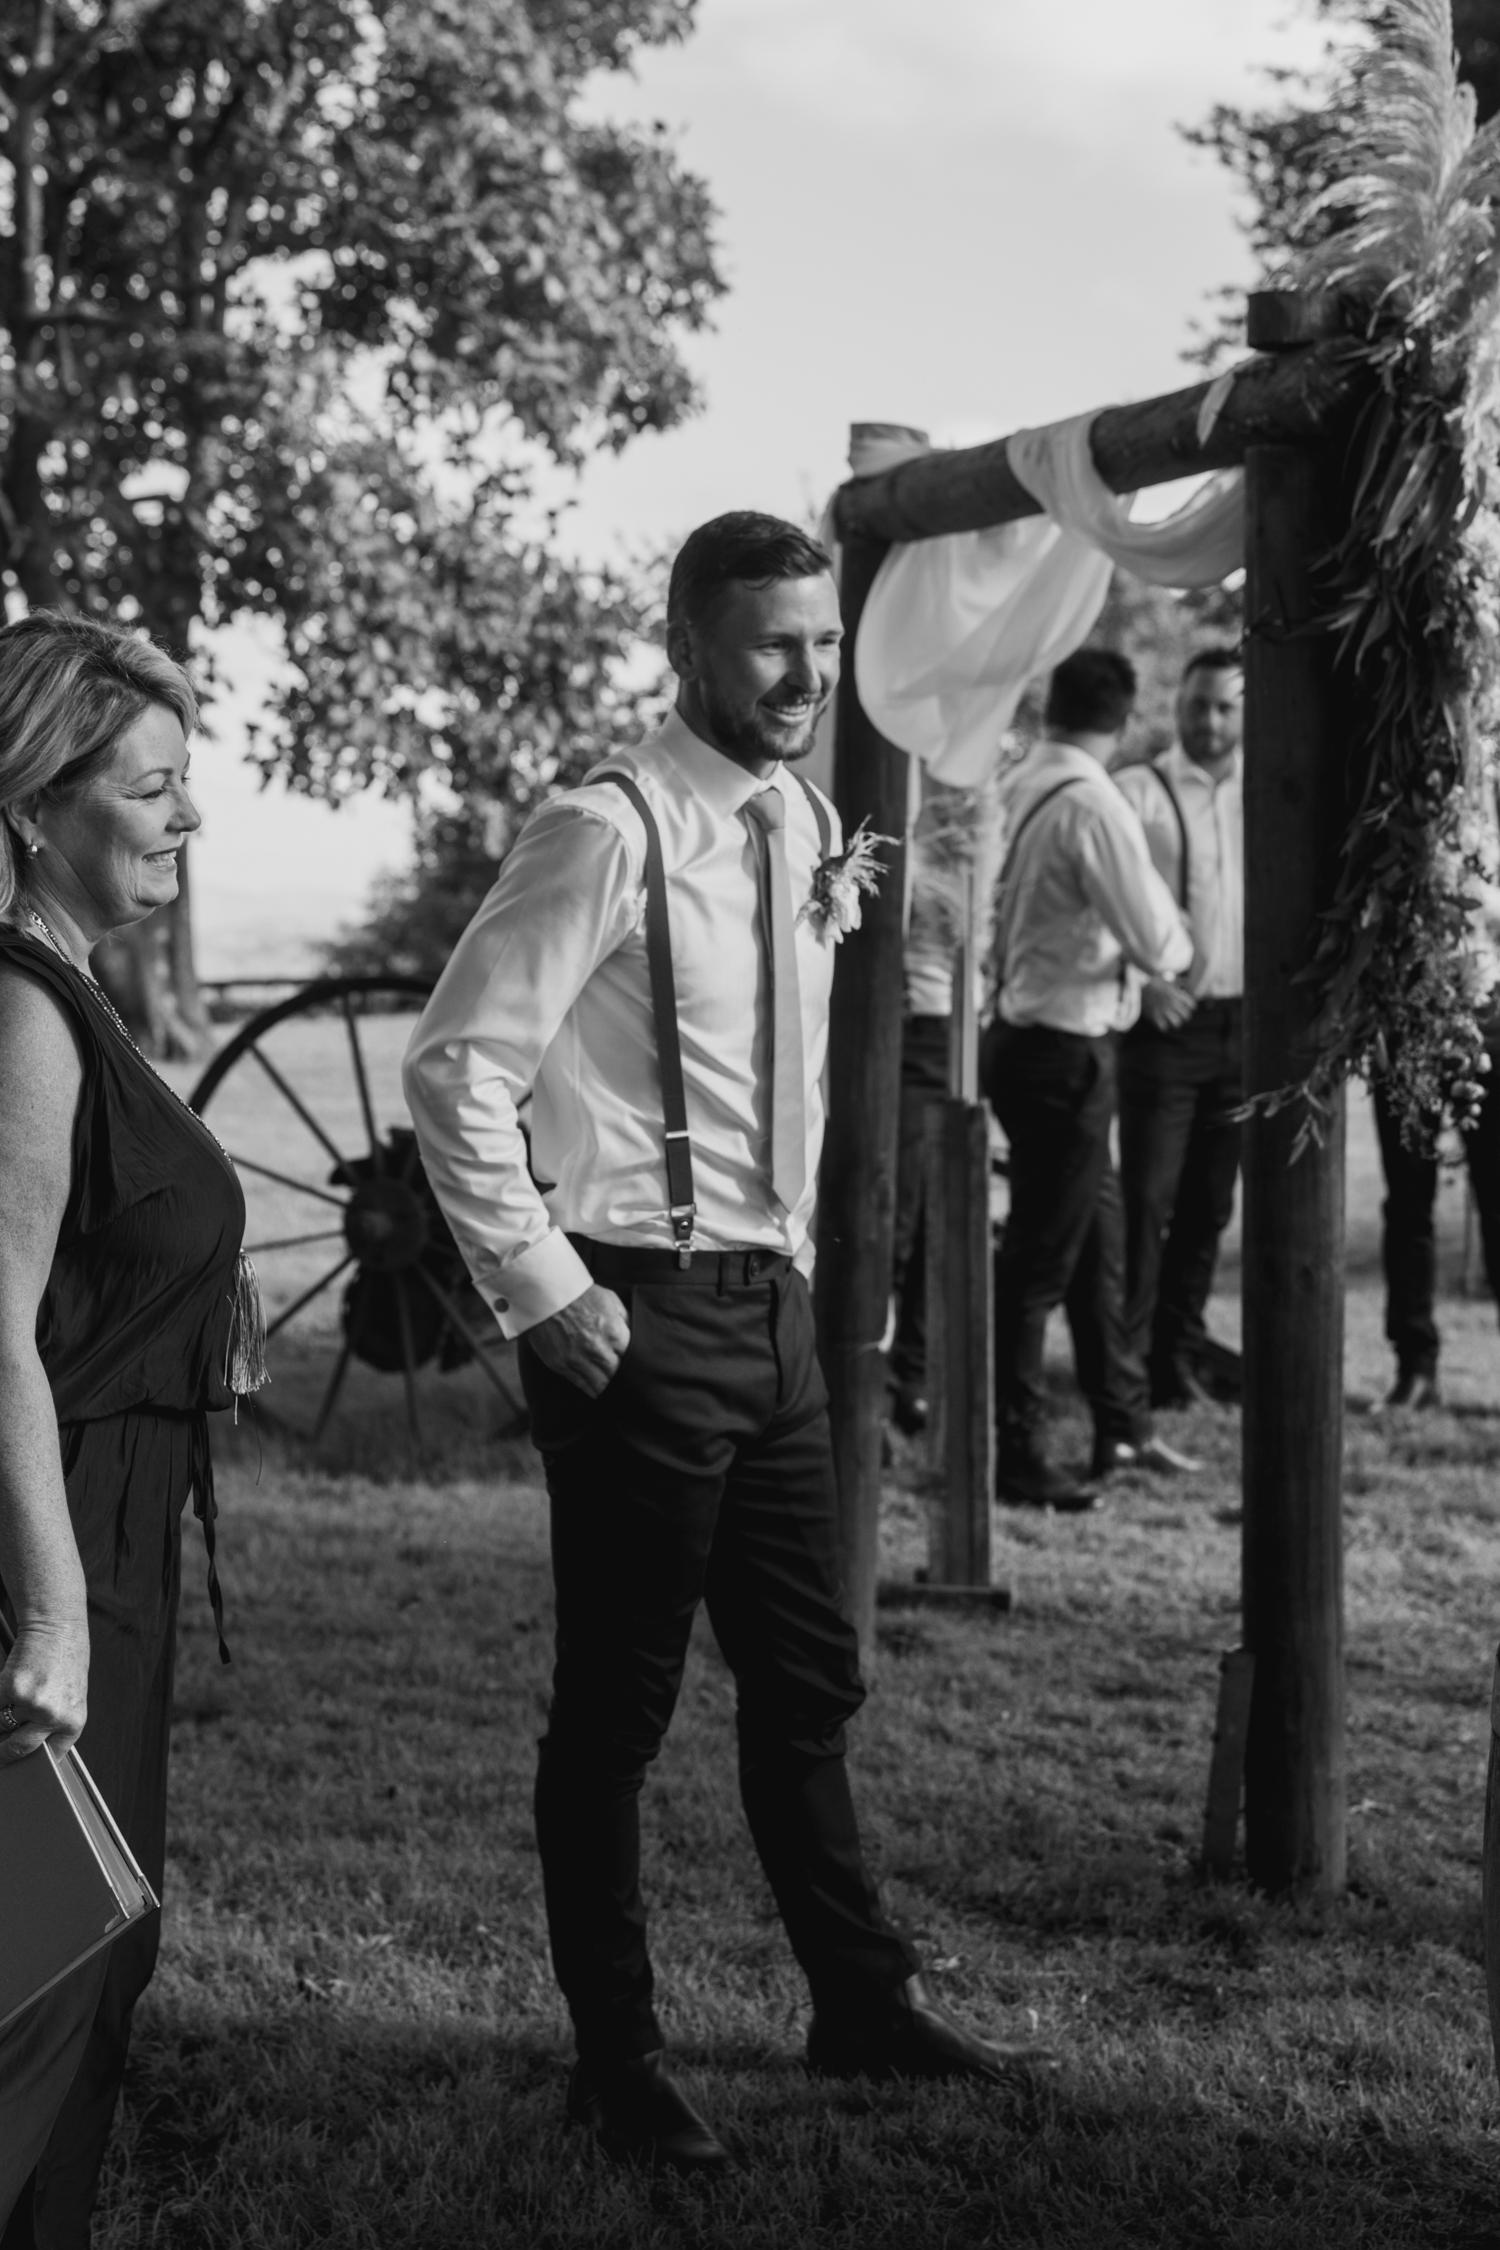 wedding-at-the-red-barn-new-zealand-wedding-photographer-groom-duyring-ceremony.jpg